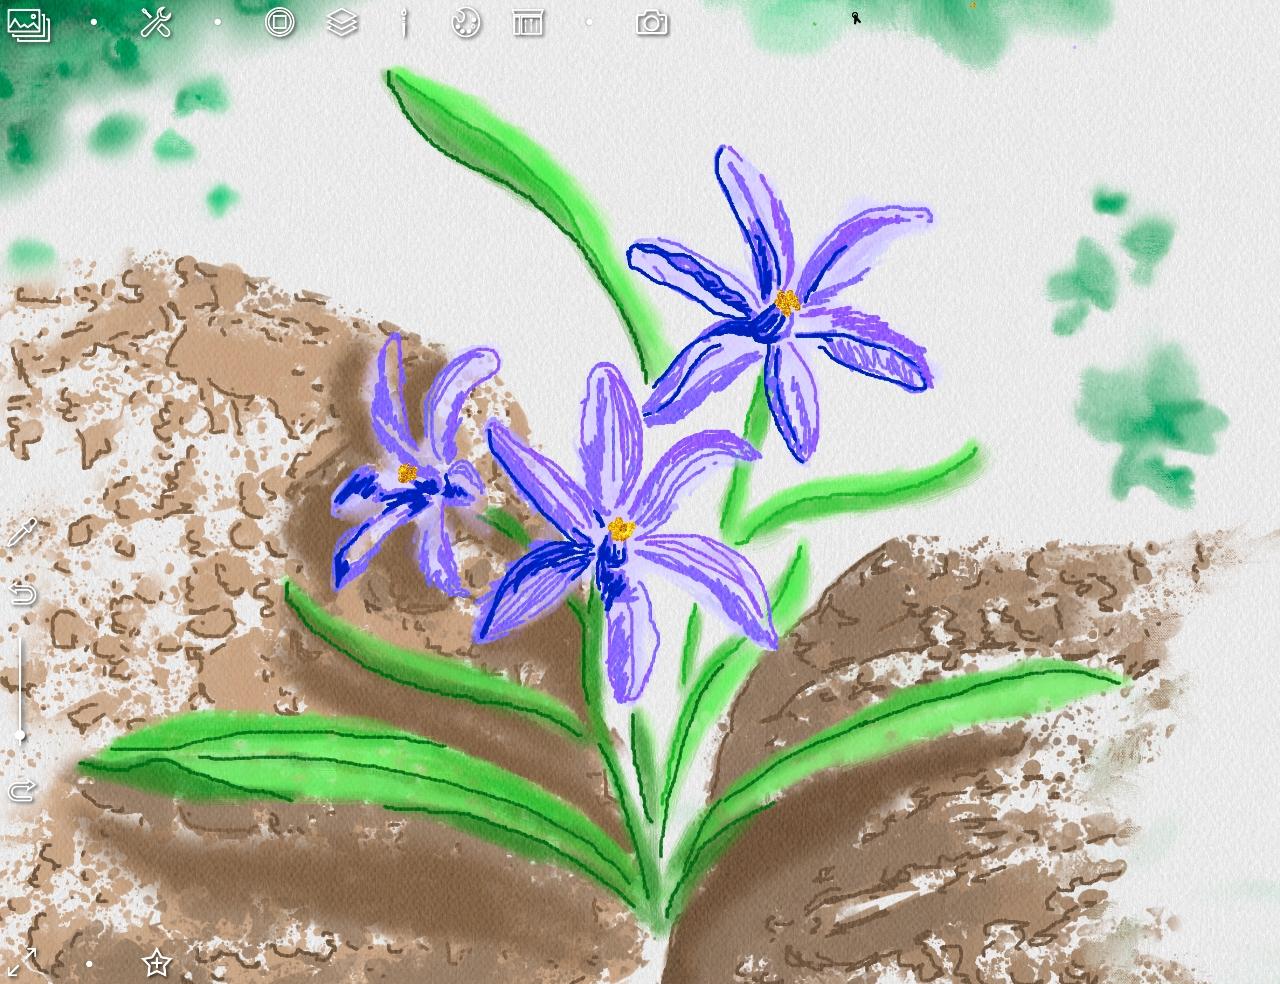 25_Готовыке цвекточки.jpg